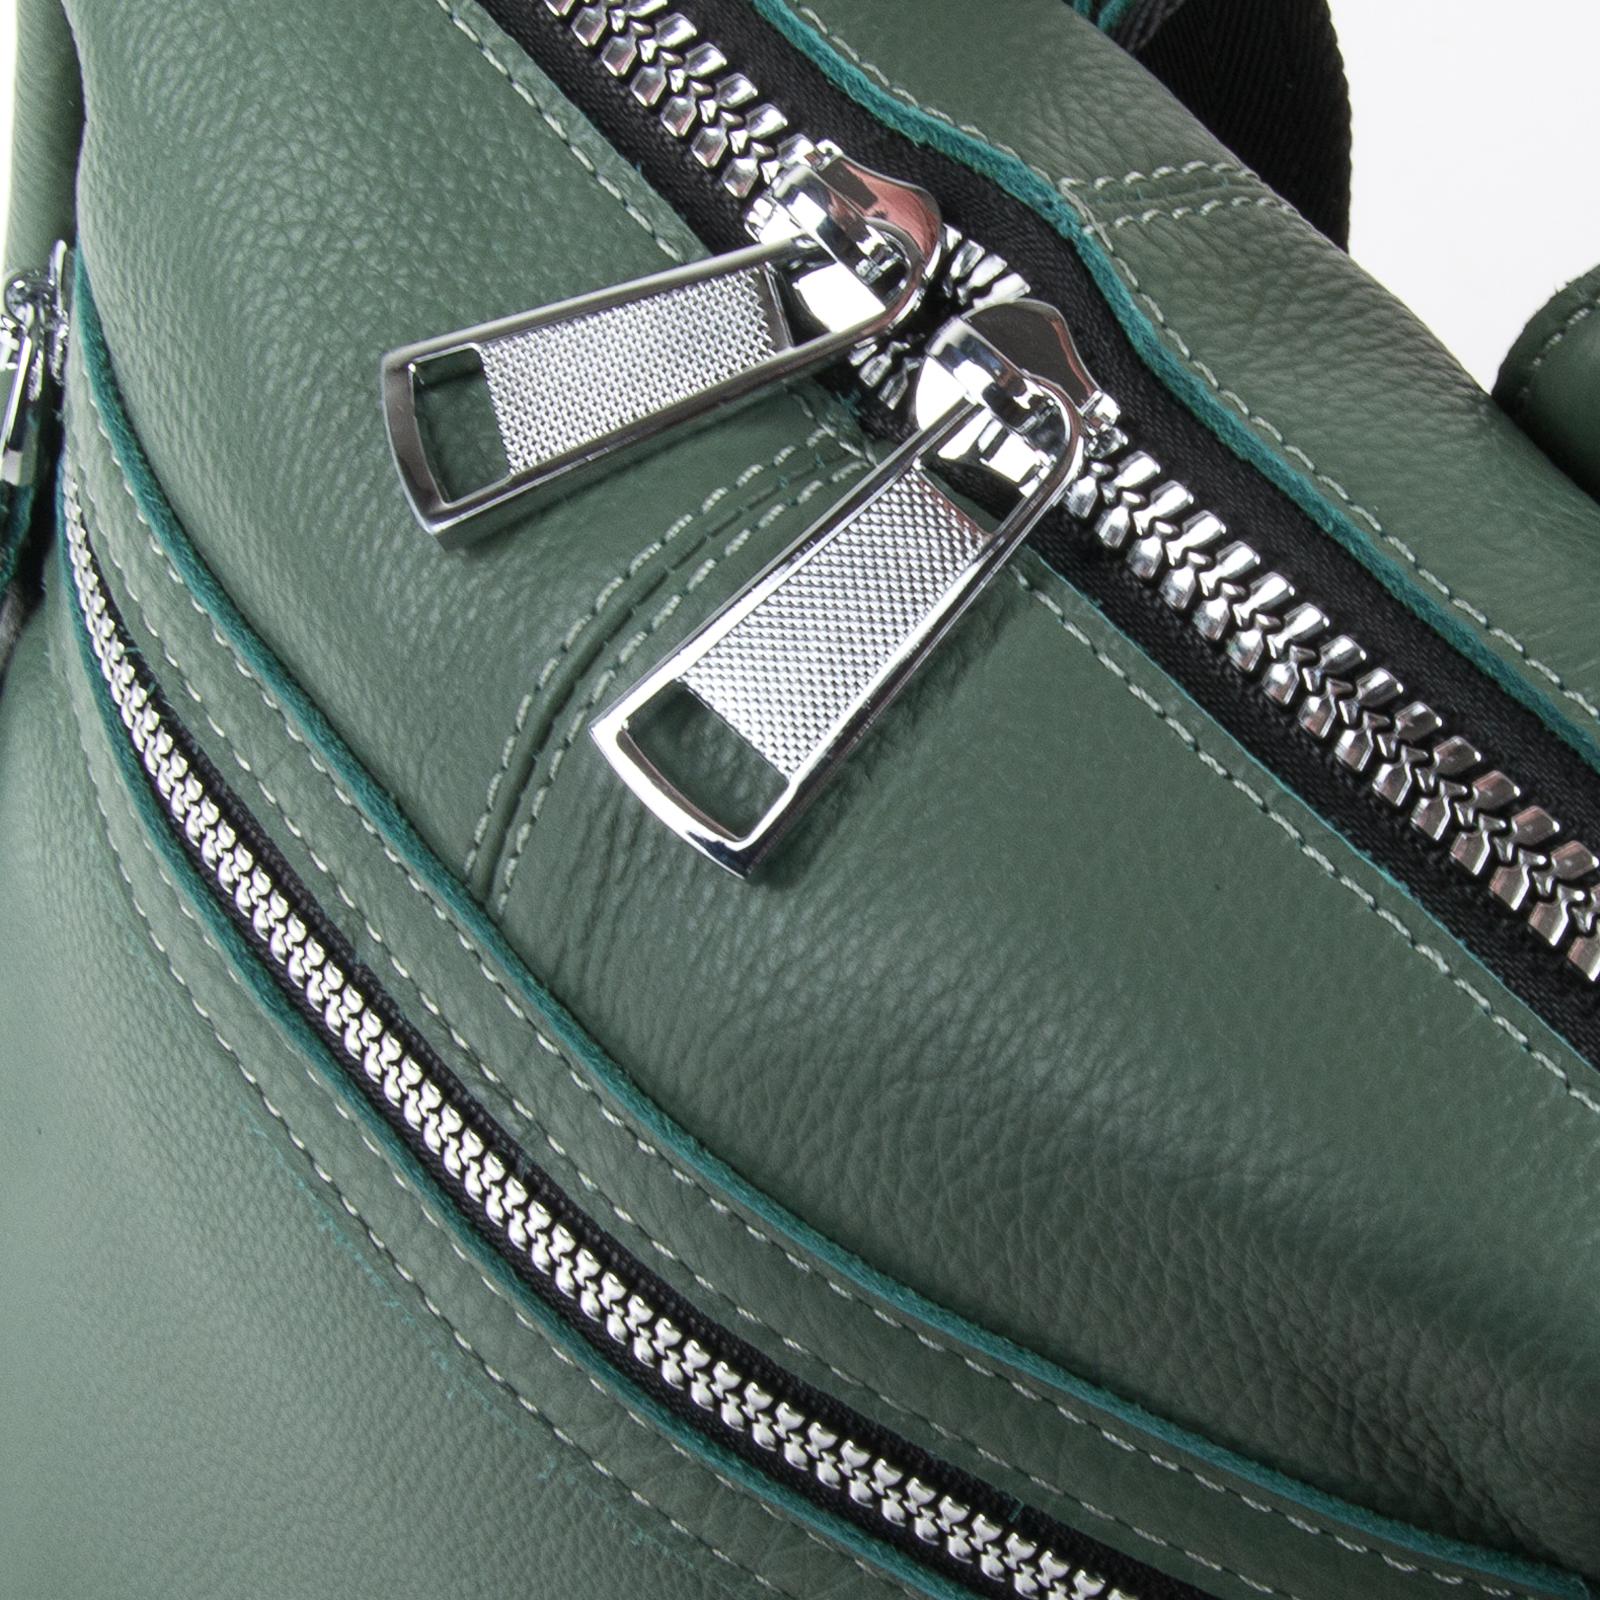 Сумка Женская Рюкзак кожа ALEX RAI 03-01 8781-9 green - фото 4